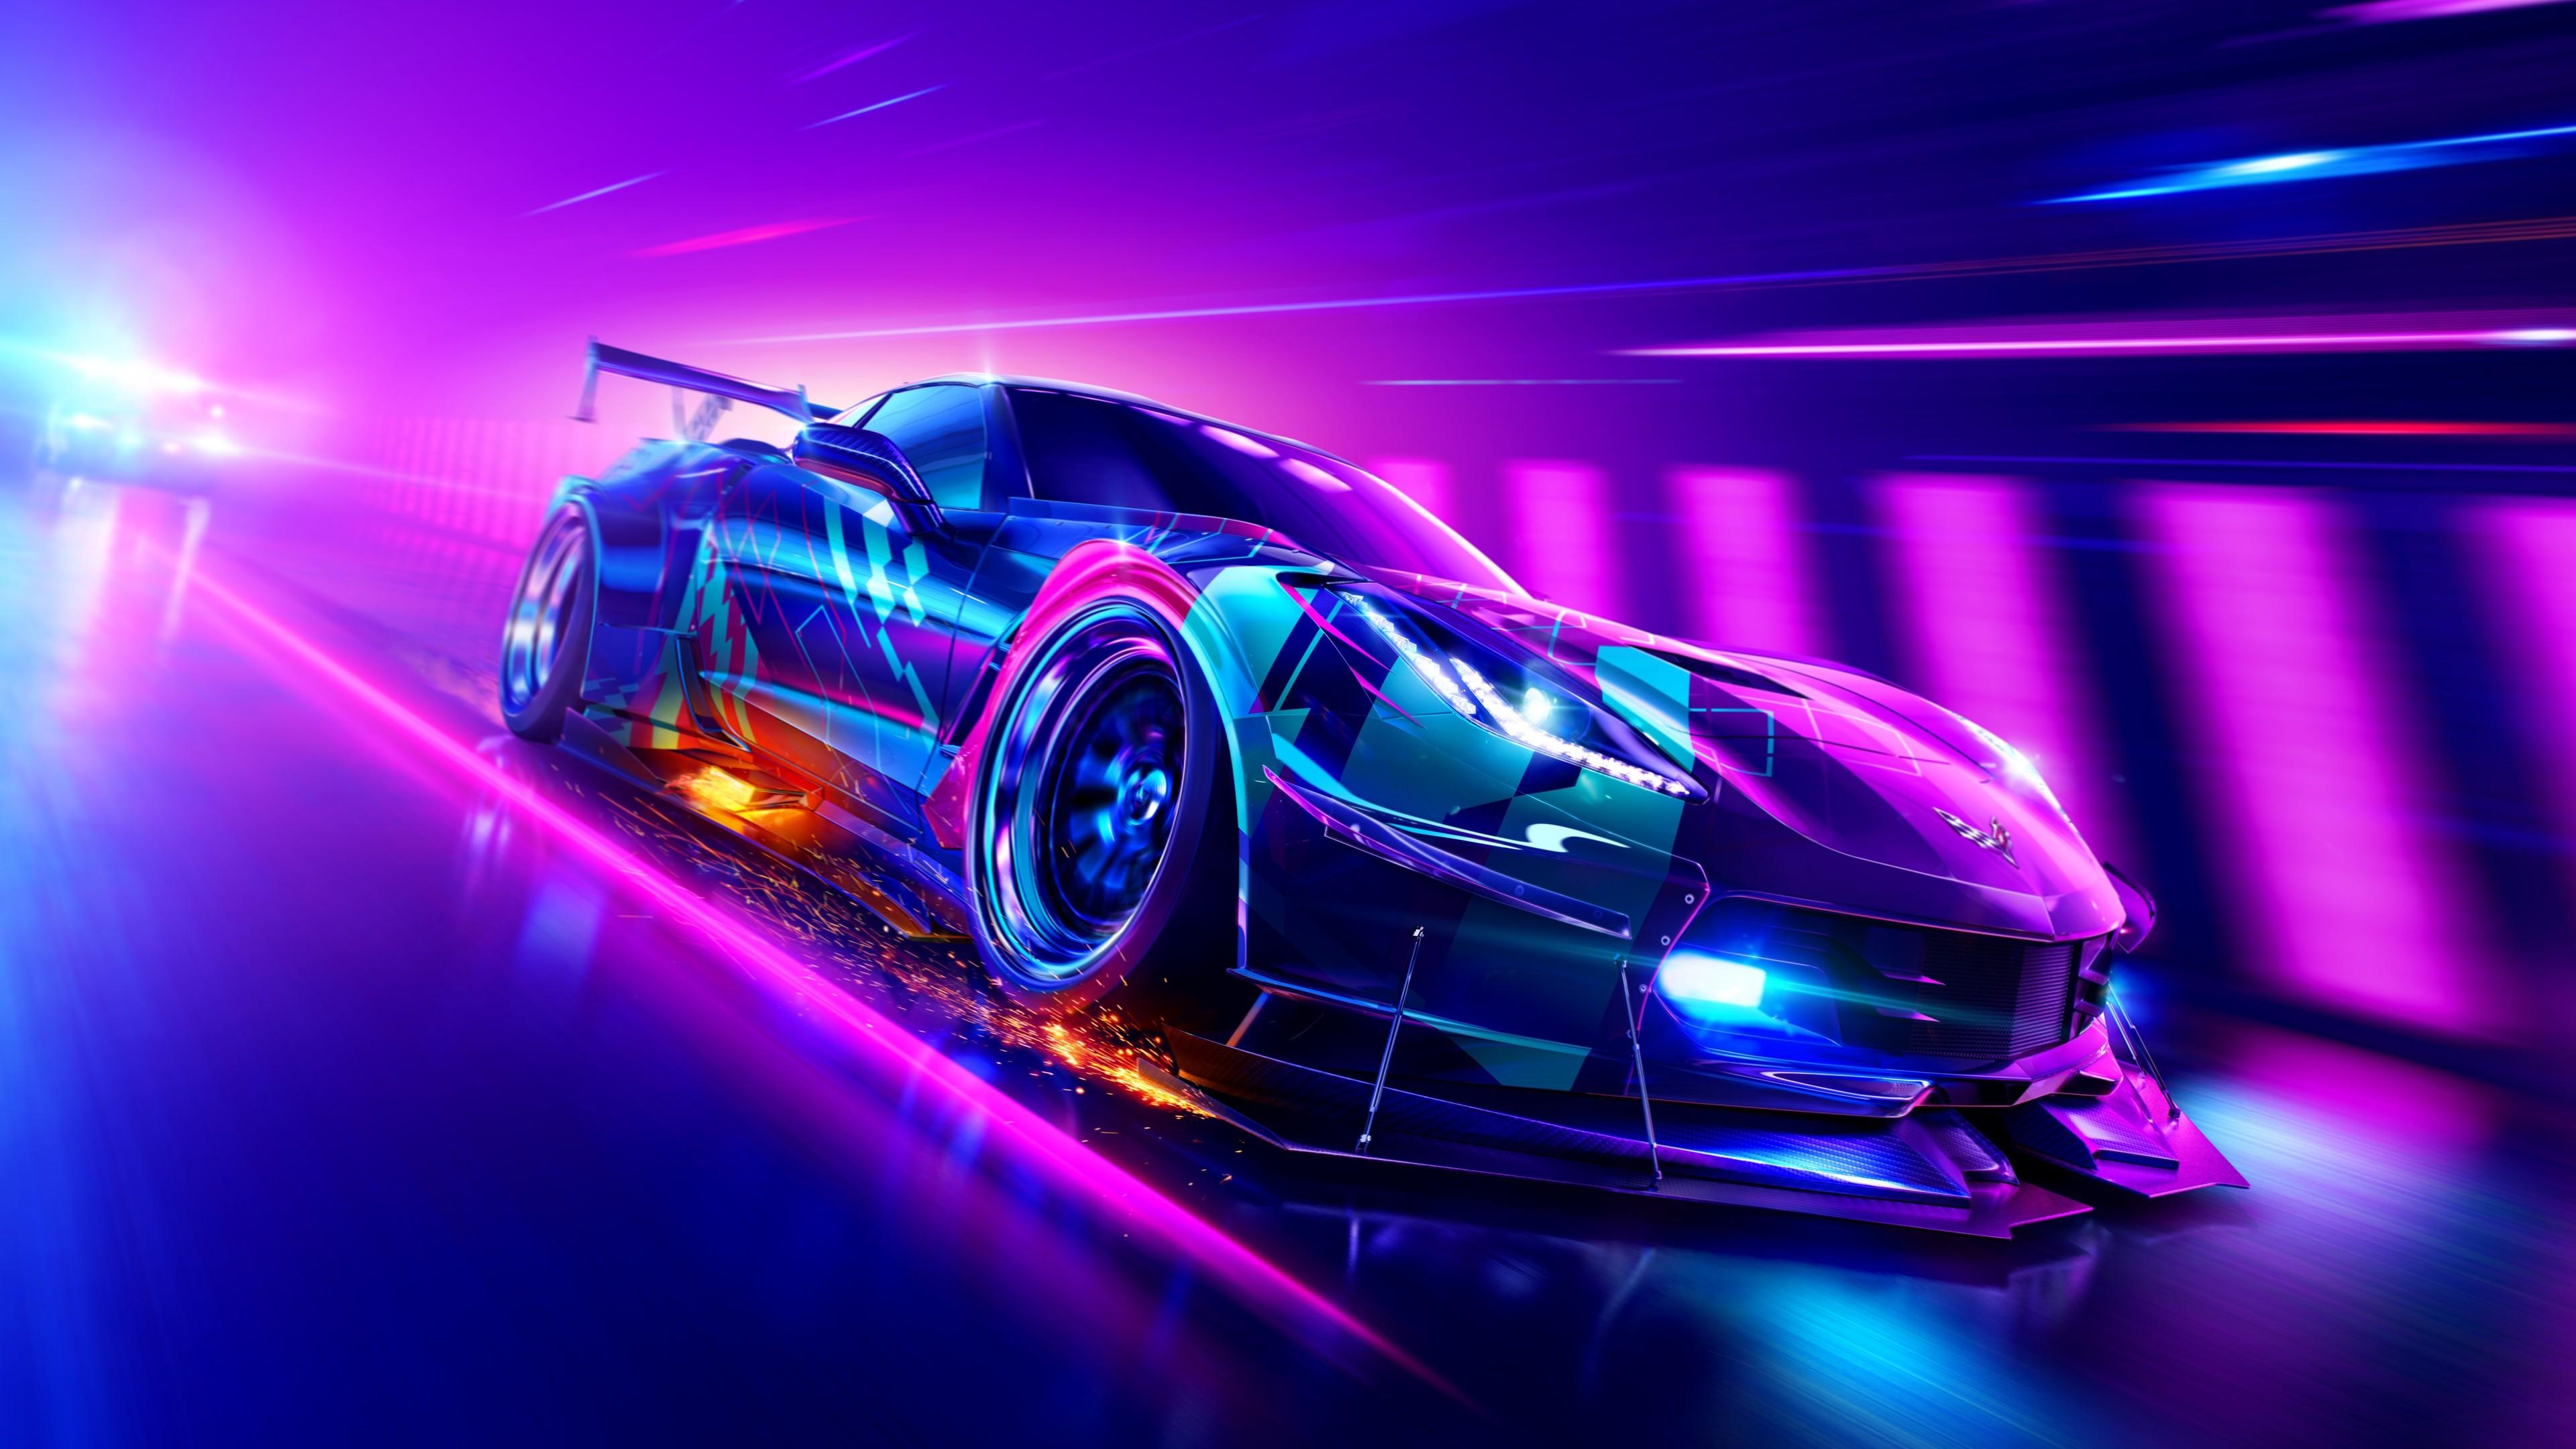 Maserati Wallpaper Iphone X Chevrolet Corvette Grand Sport In Need For Speed Heat